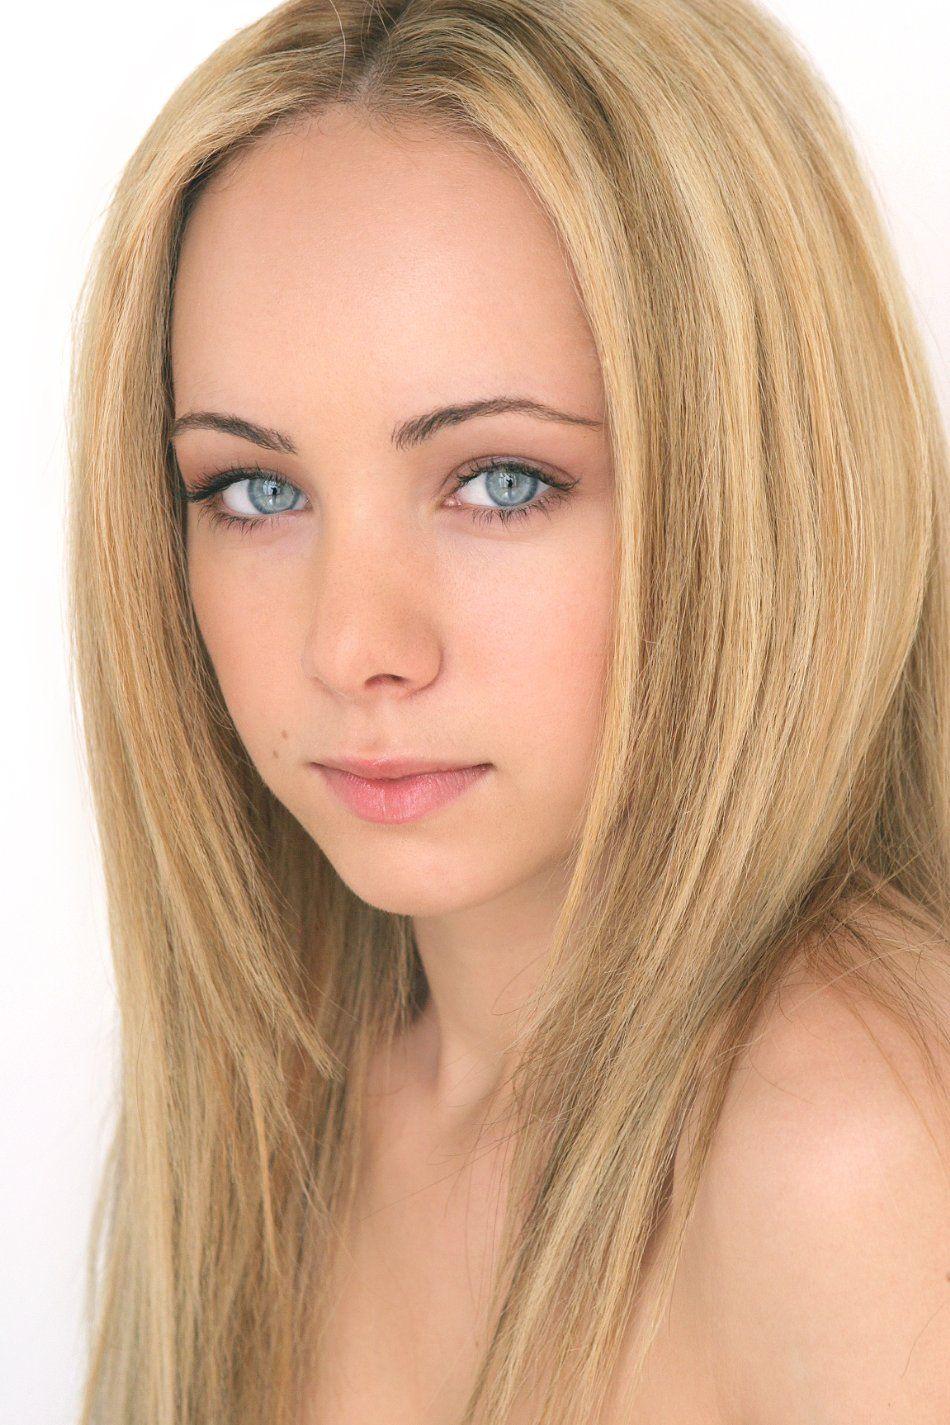 Ksenia Solo - Lost-Girl Photo  Unique Eyes I  Pinterest -7974